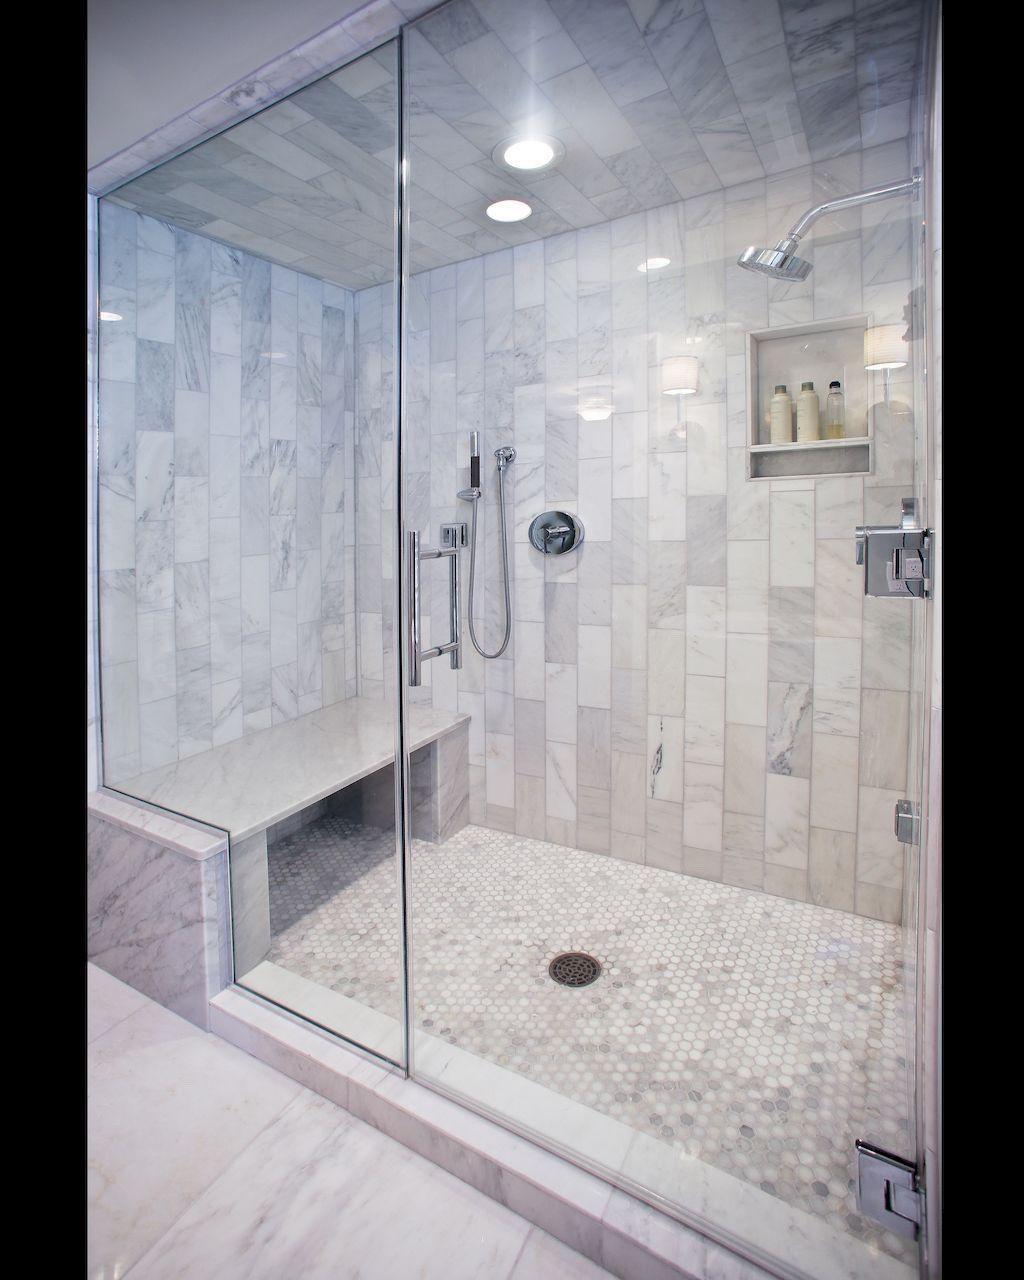 Bathroom Ideas Bathroom Renovations On A Budget Relooking De Petite Salle De Bain Remodeler La Douche Amenagement Salle De Bain